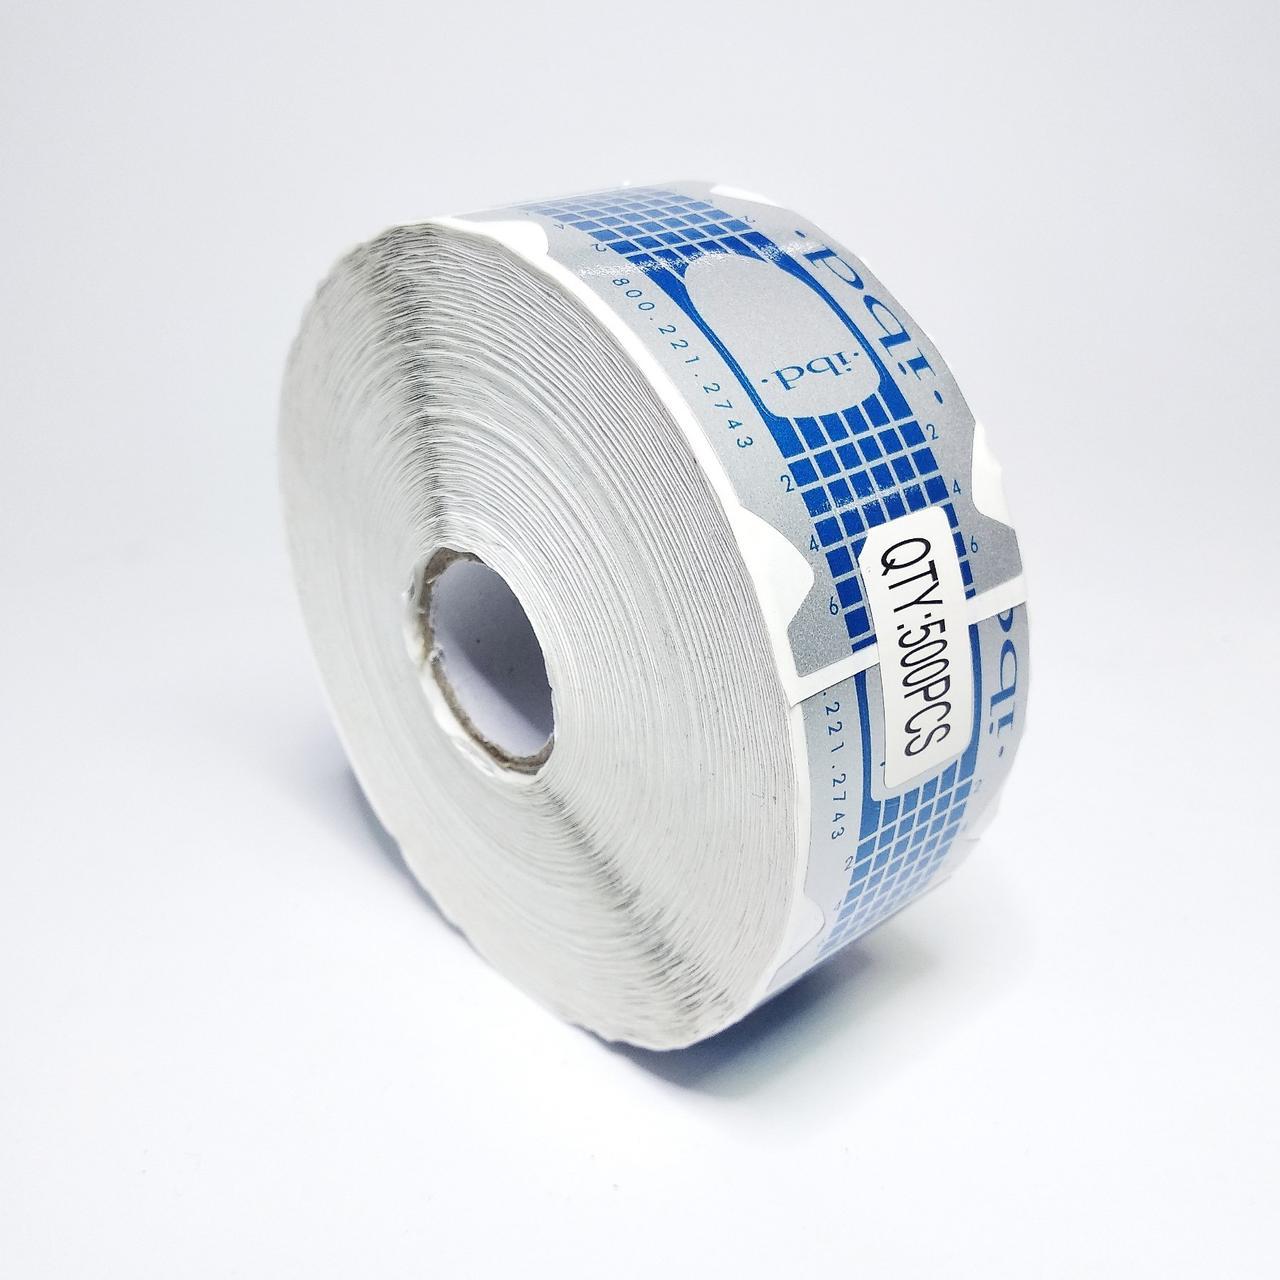 Формы для наращивания ногтей ibd 500 шт рулон